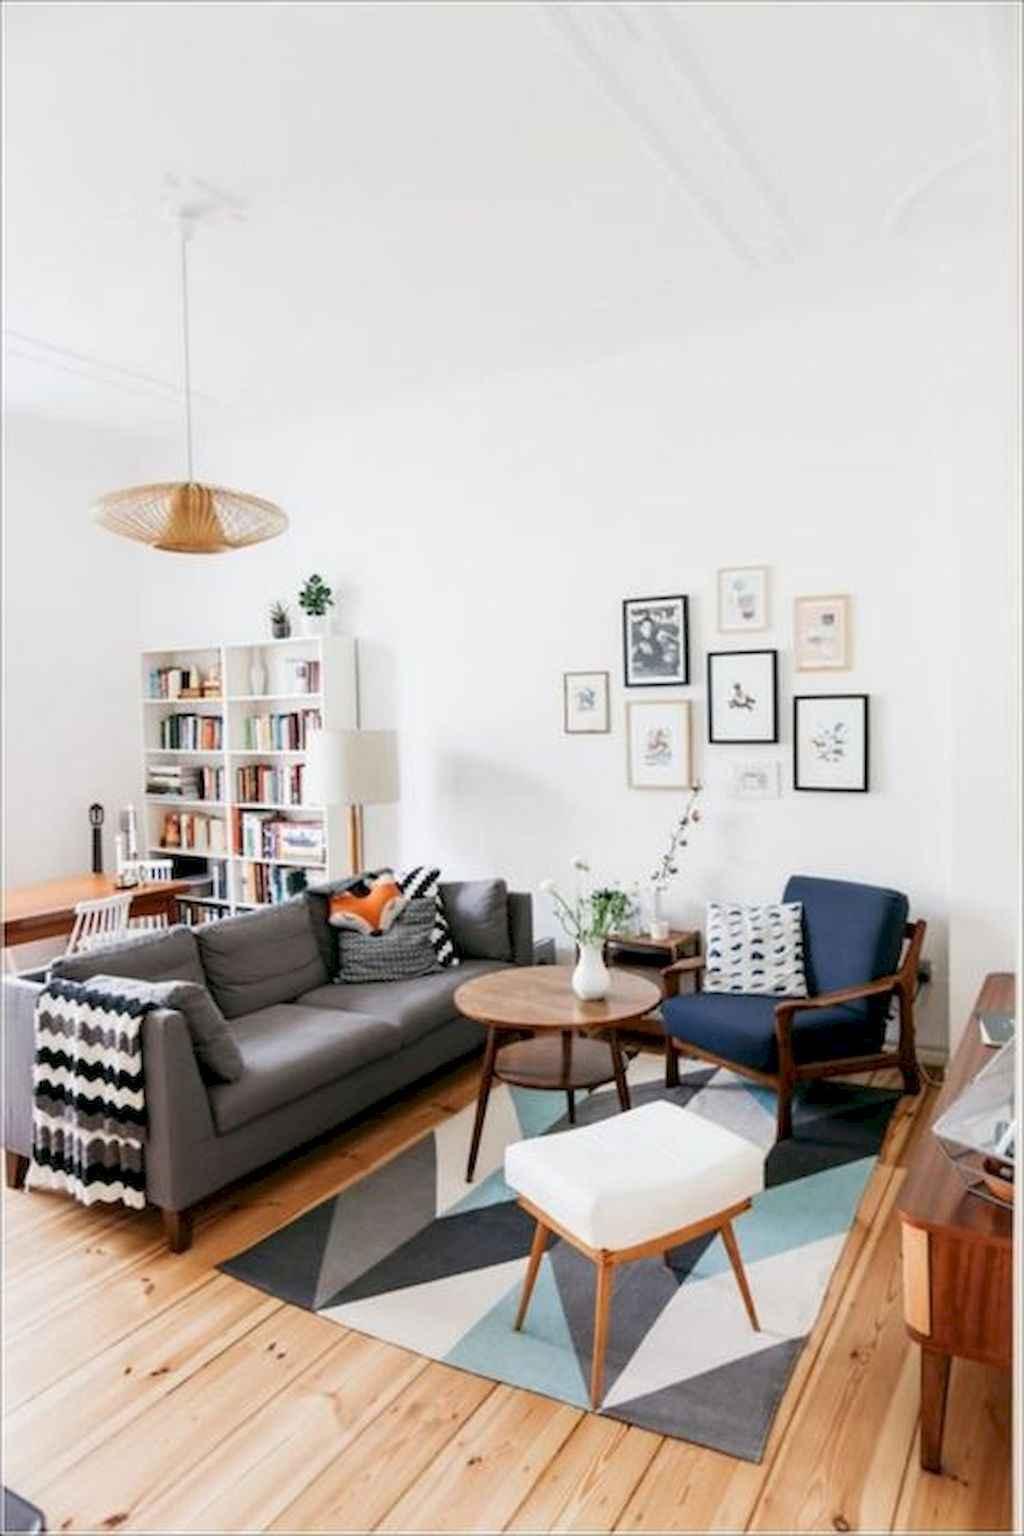 Small apartment decorating ideas (43)